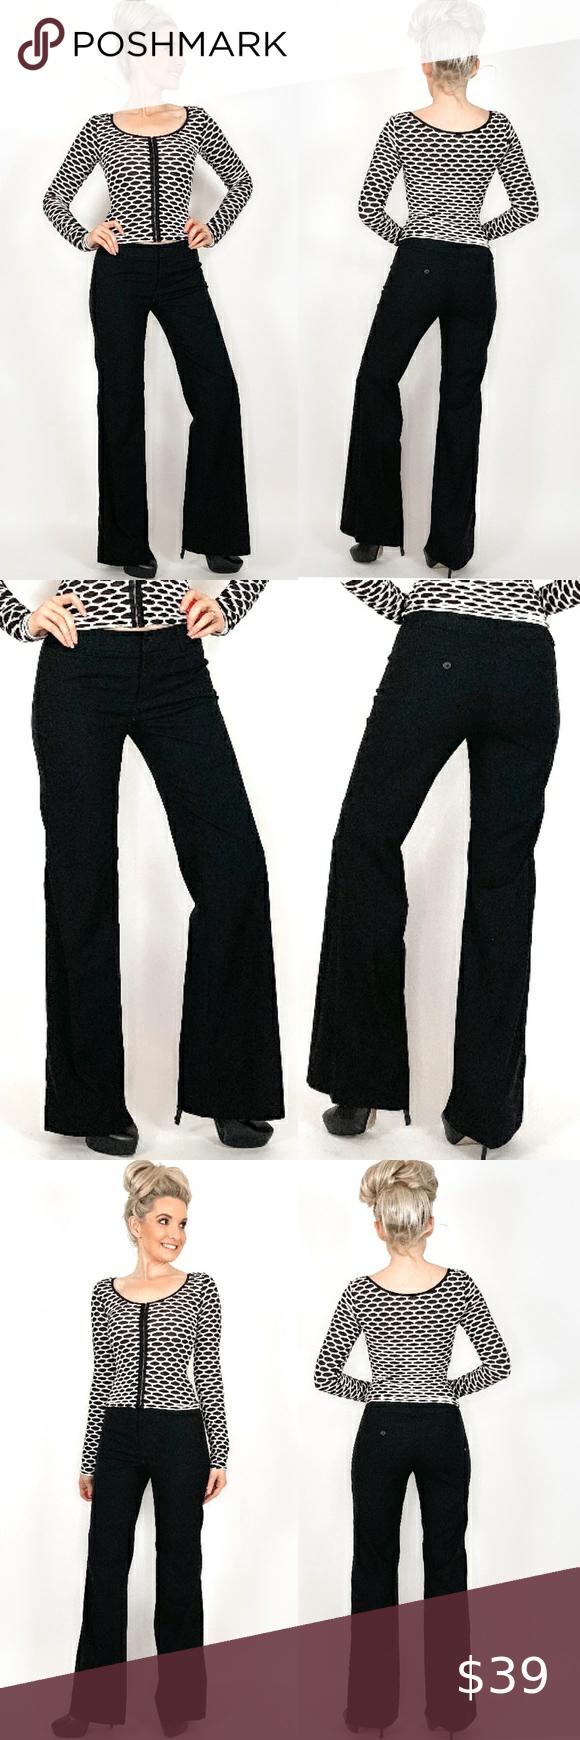 Tall Long Black Dress Pants Black Dress Pants Pinstripe Dress Pants Long Black Dress [ 1740 x 580 Pixel ]